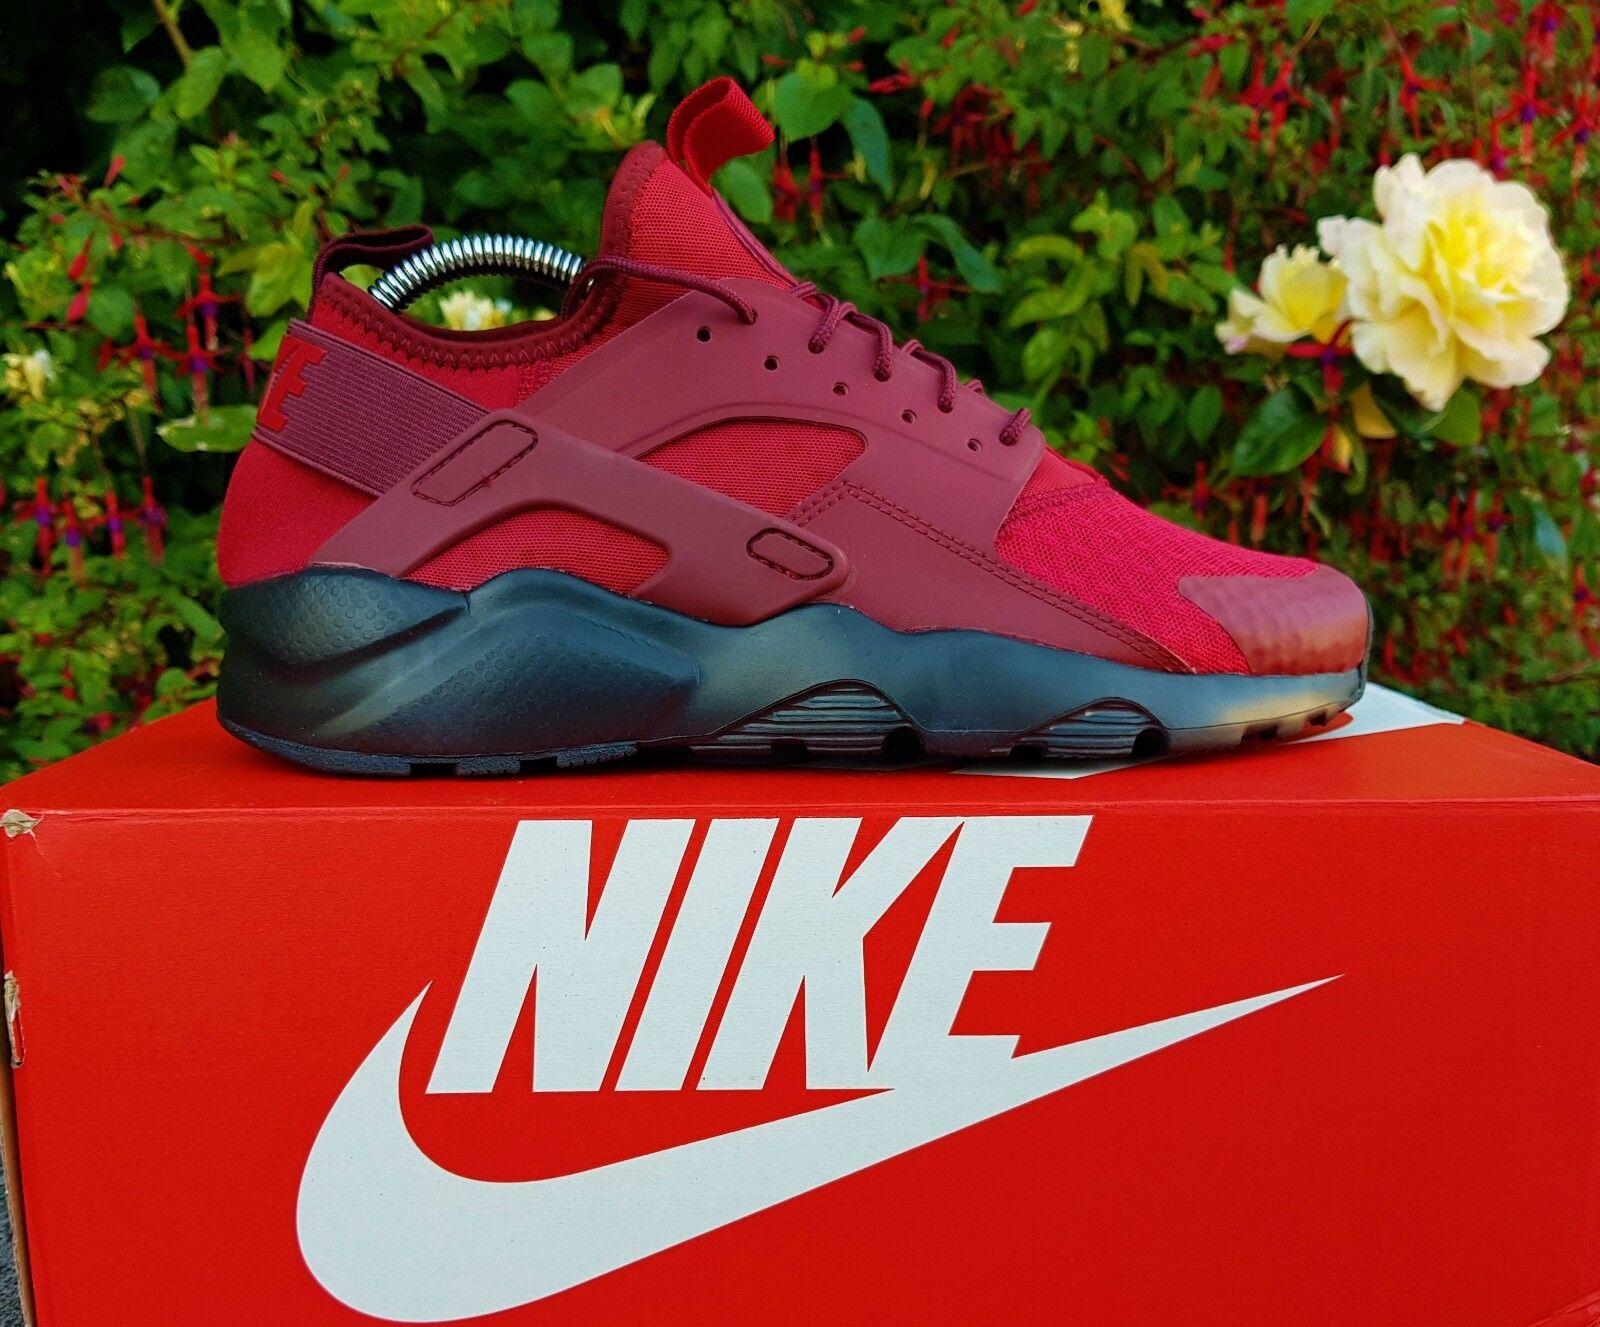 BNWB & Authentic Nike Air Huarache ROT Run Ultra ® Tough ROT Huarache Trainers UK Größe 10 4efaa5